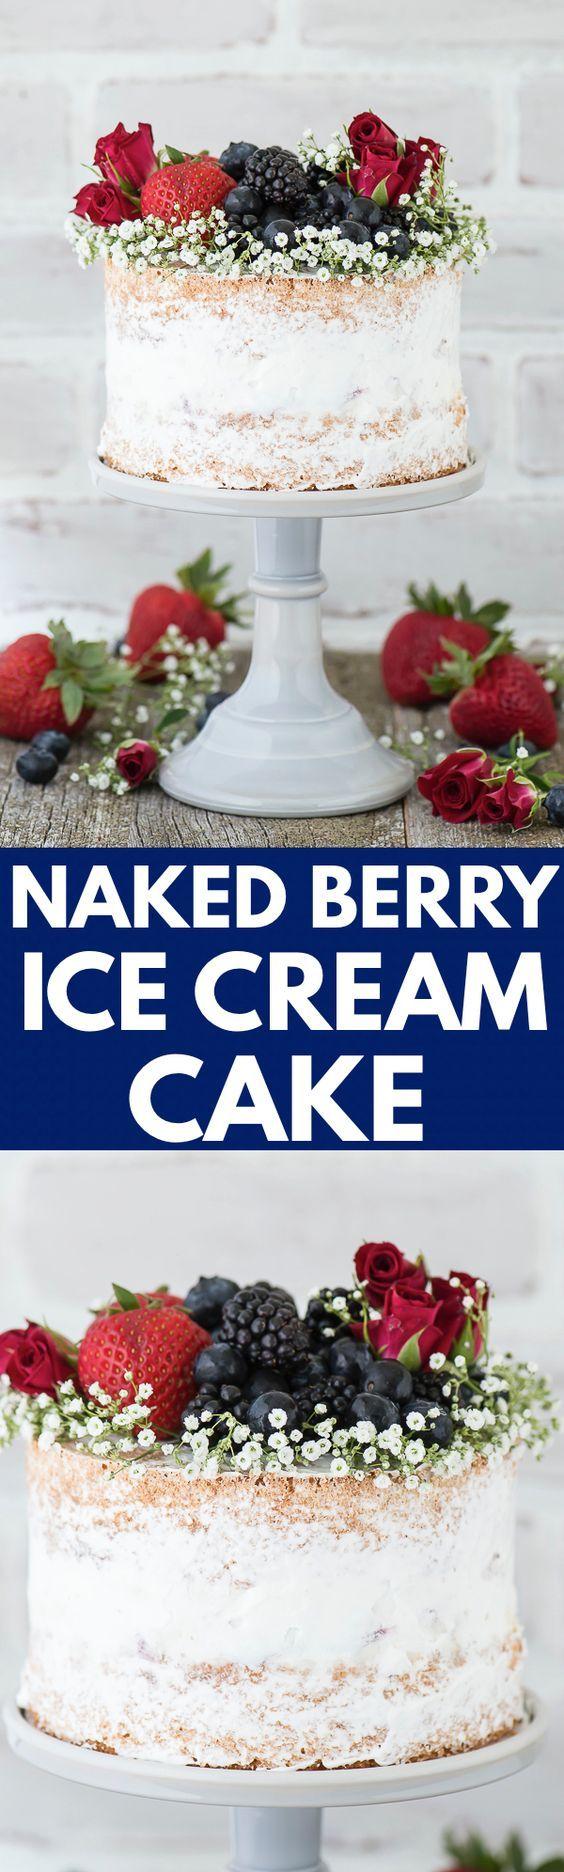 ... vanilla bean cake and a layer of homemade vanilla bean berry ice cream